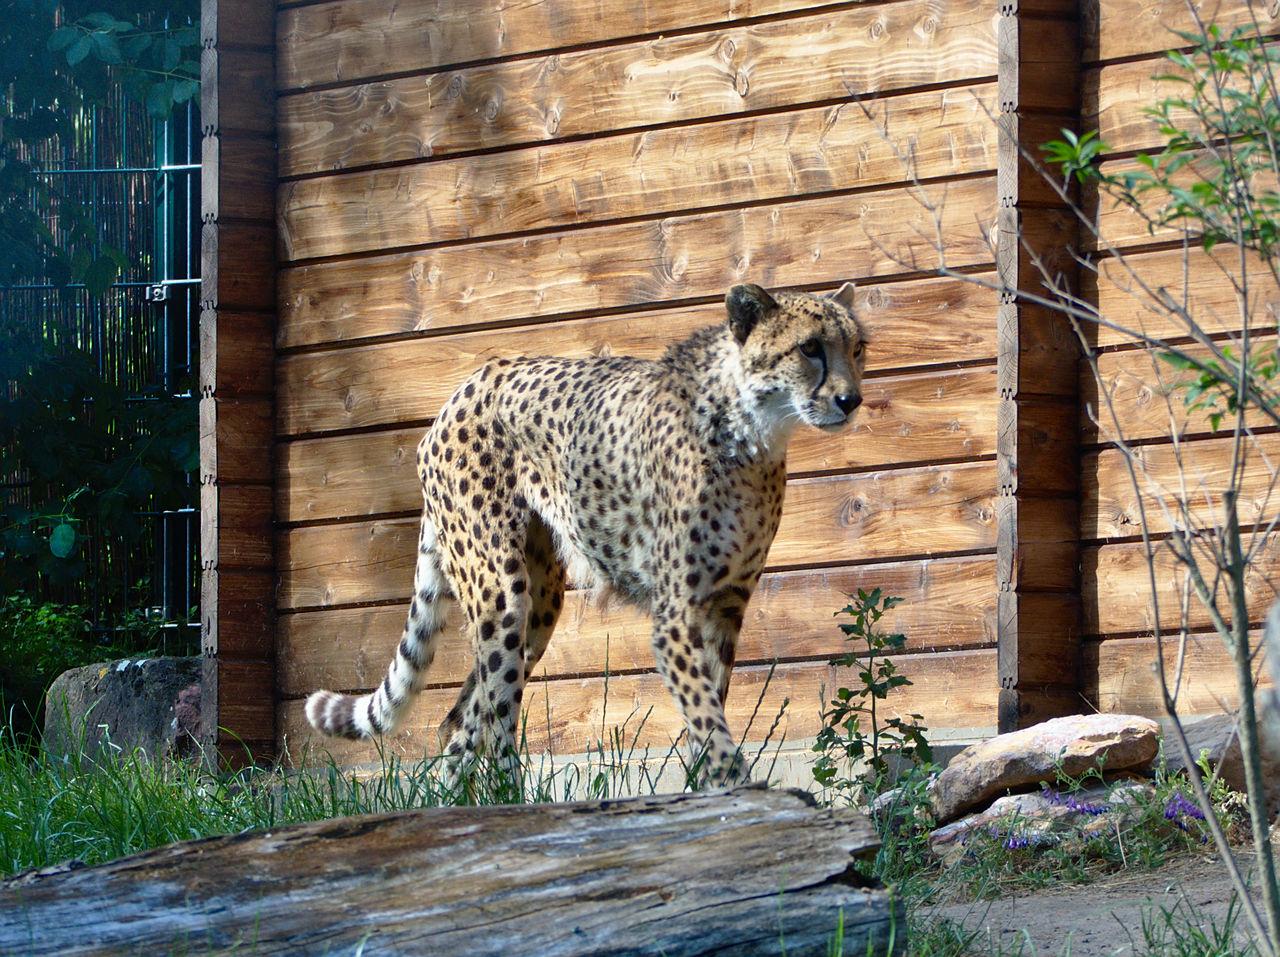 20190613_Zoo_Landau_059